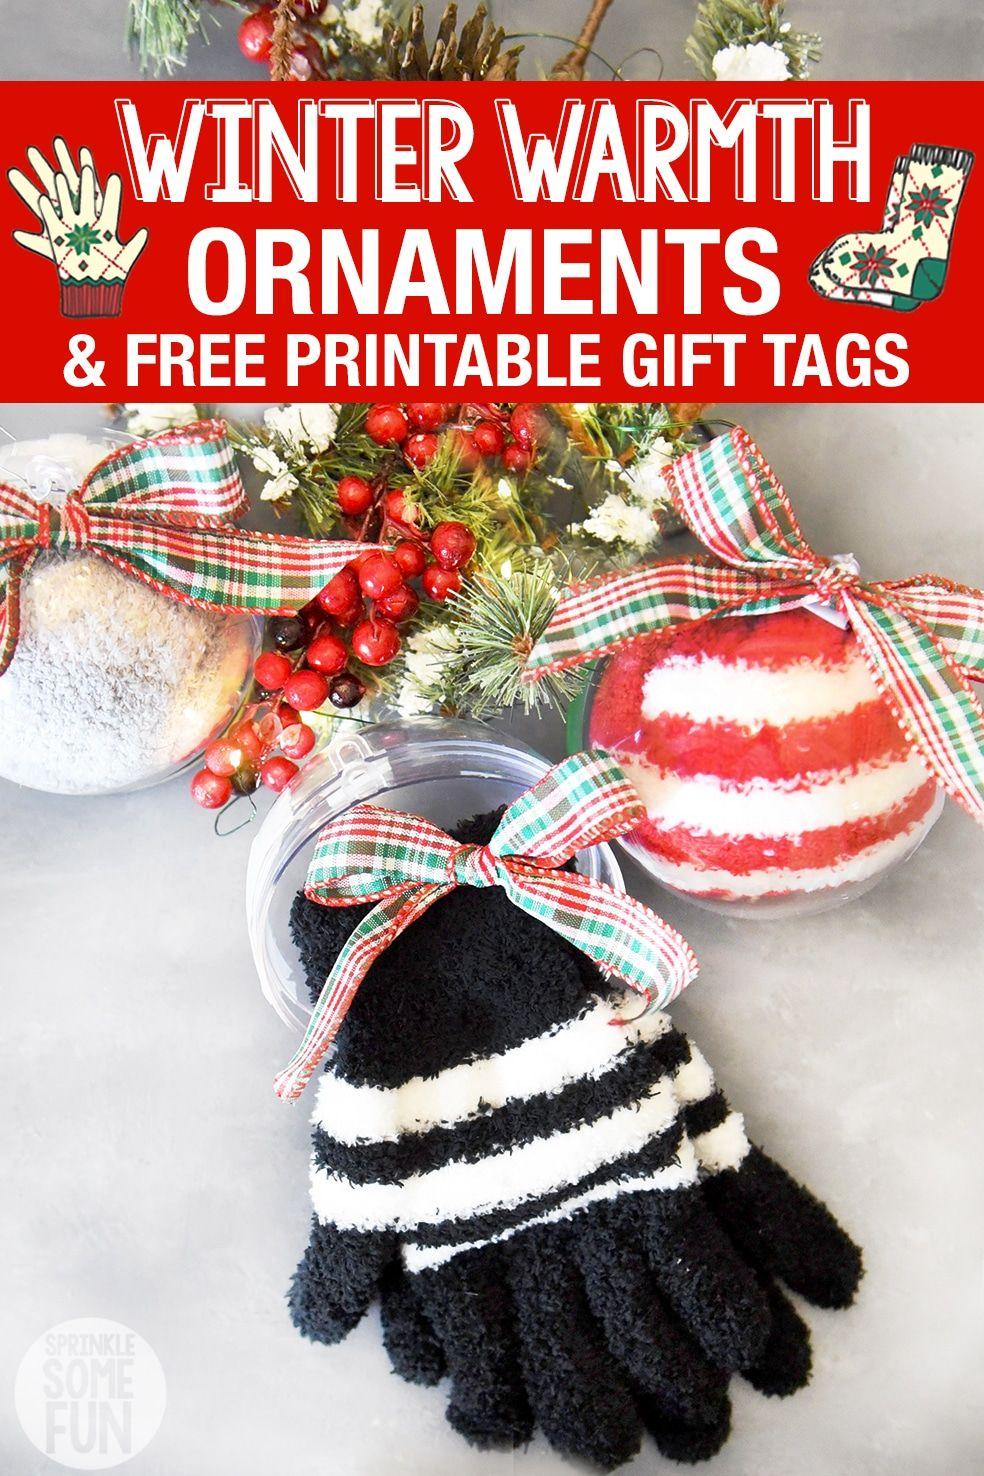 Winter Socks & Gloves Ornaments ⋆ DIY Frugal Christmas Gift ...